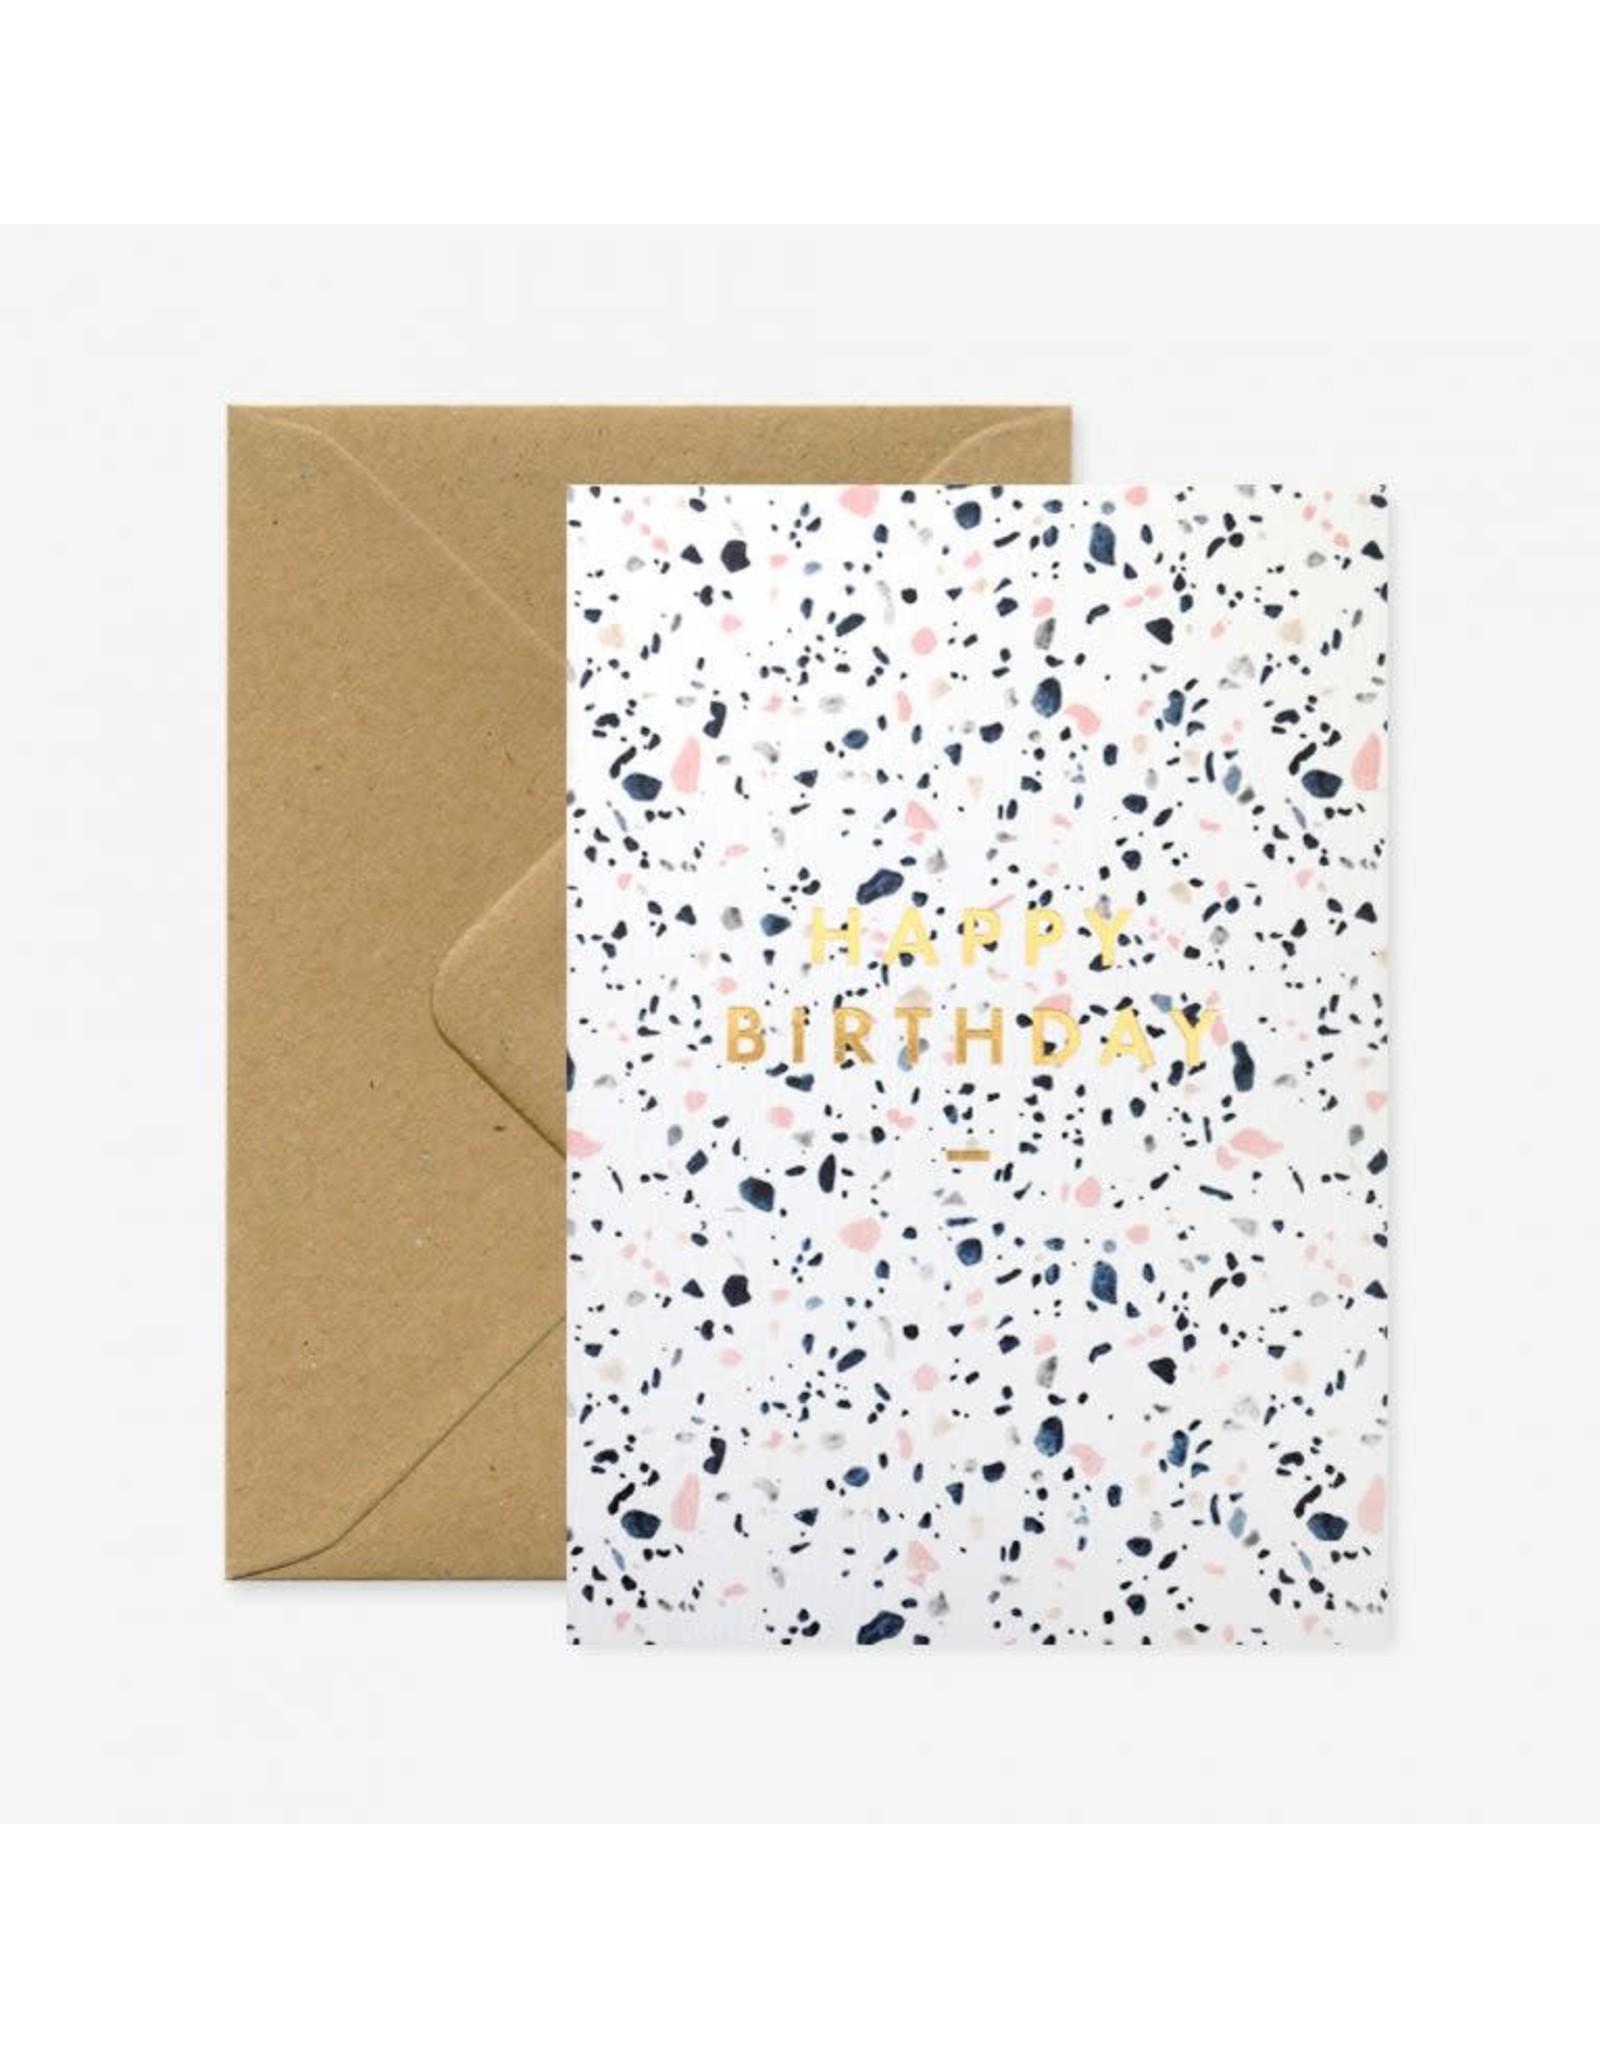 ATWS Wenskaart - Happy Birthday Terazzo - Dubbele kaart + Envelop - 11,5 x 16,5 - Blanco